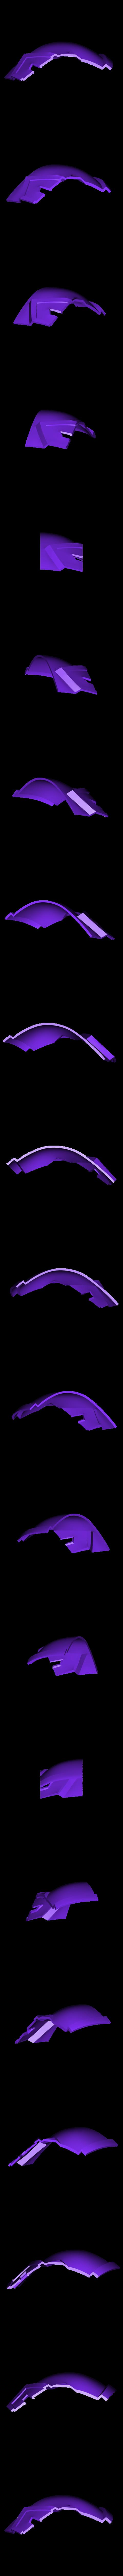 Part_4_v3.stl Download free STL file Blood Dragon Helmet Mass Effect 2 • Design to 3D print, VillainousPropShop